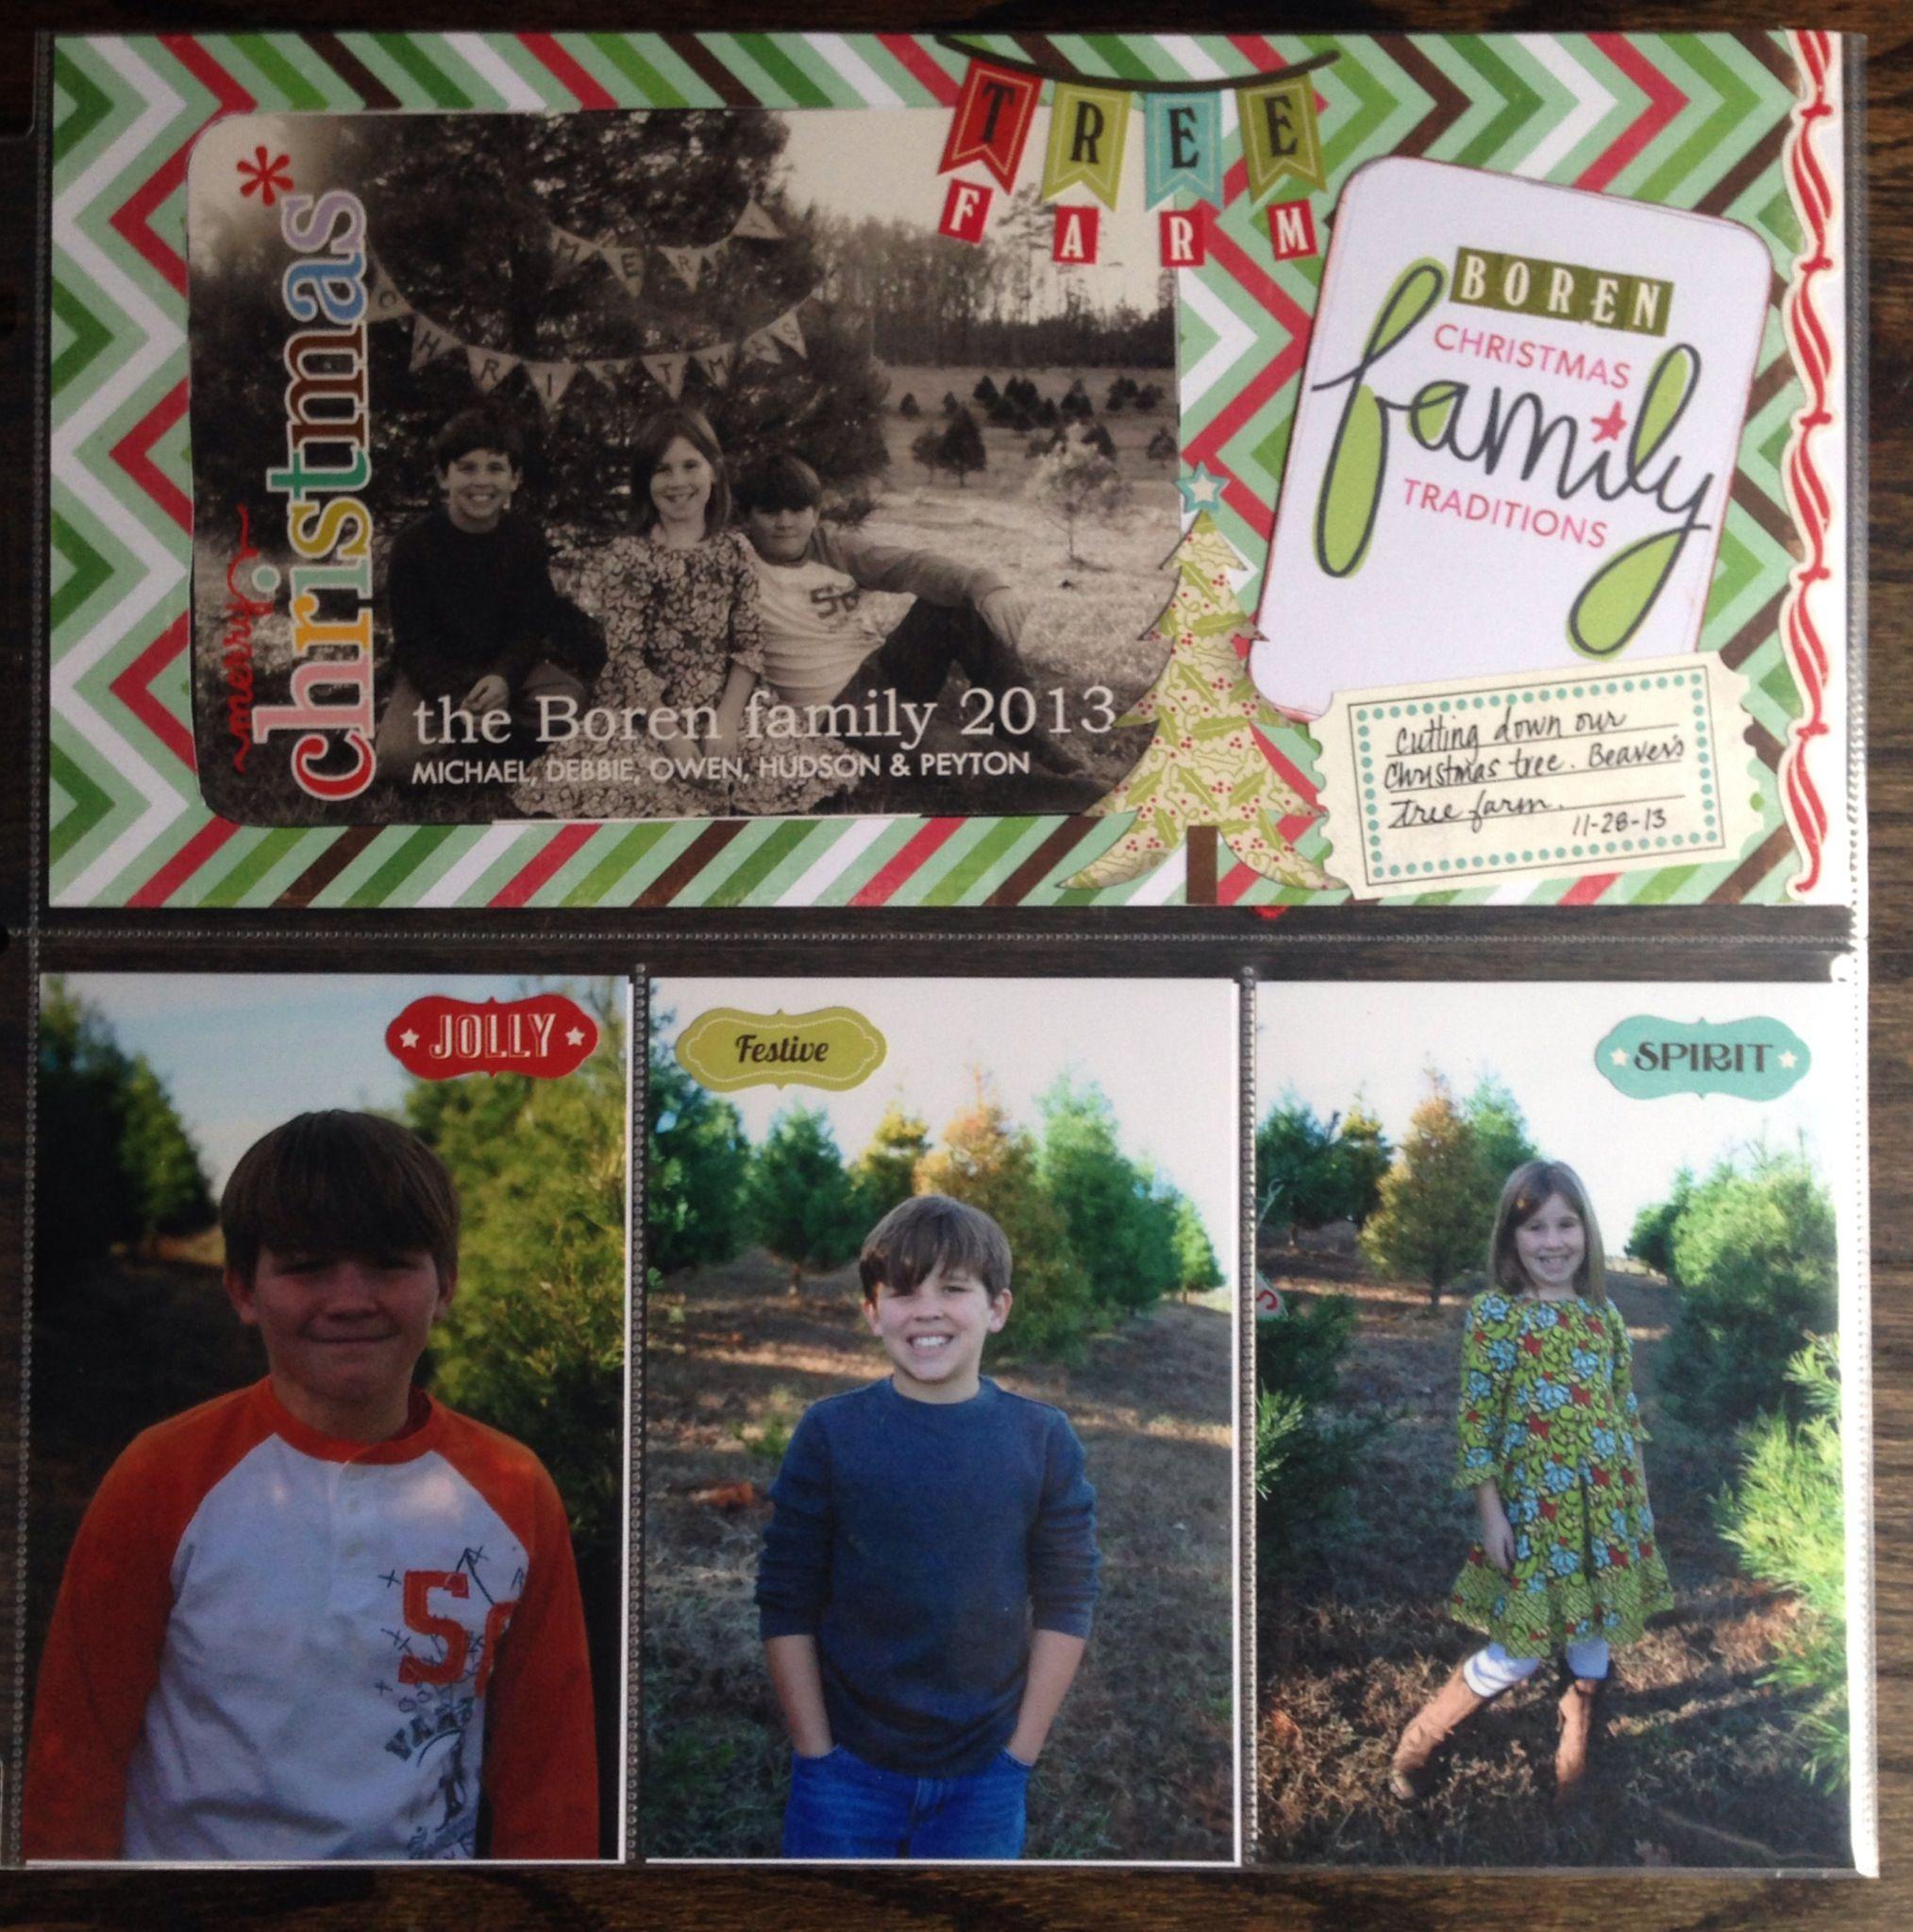 Scrapbook ideas christmas card - Christmas Card Photo Shoot Scrapbook Layout